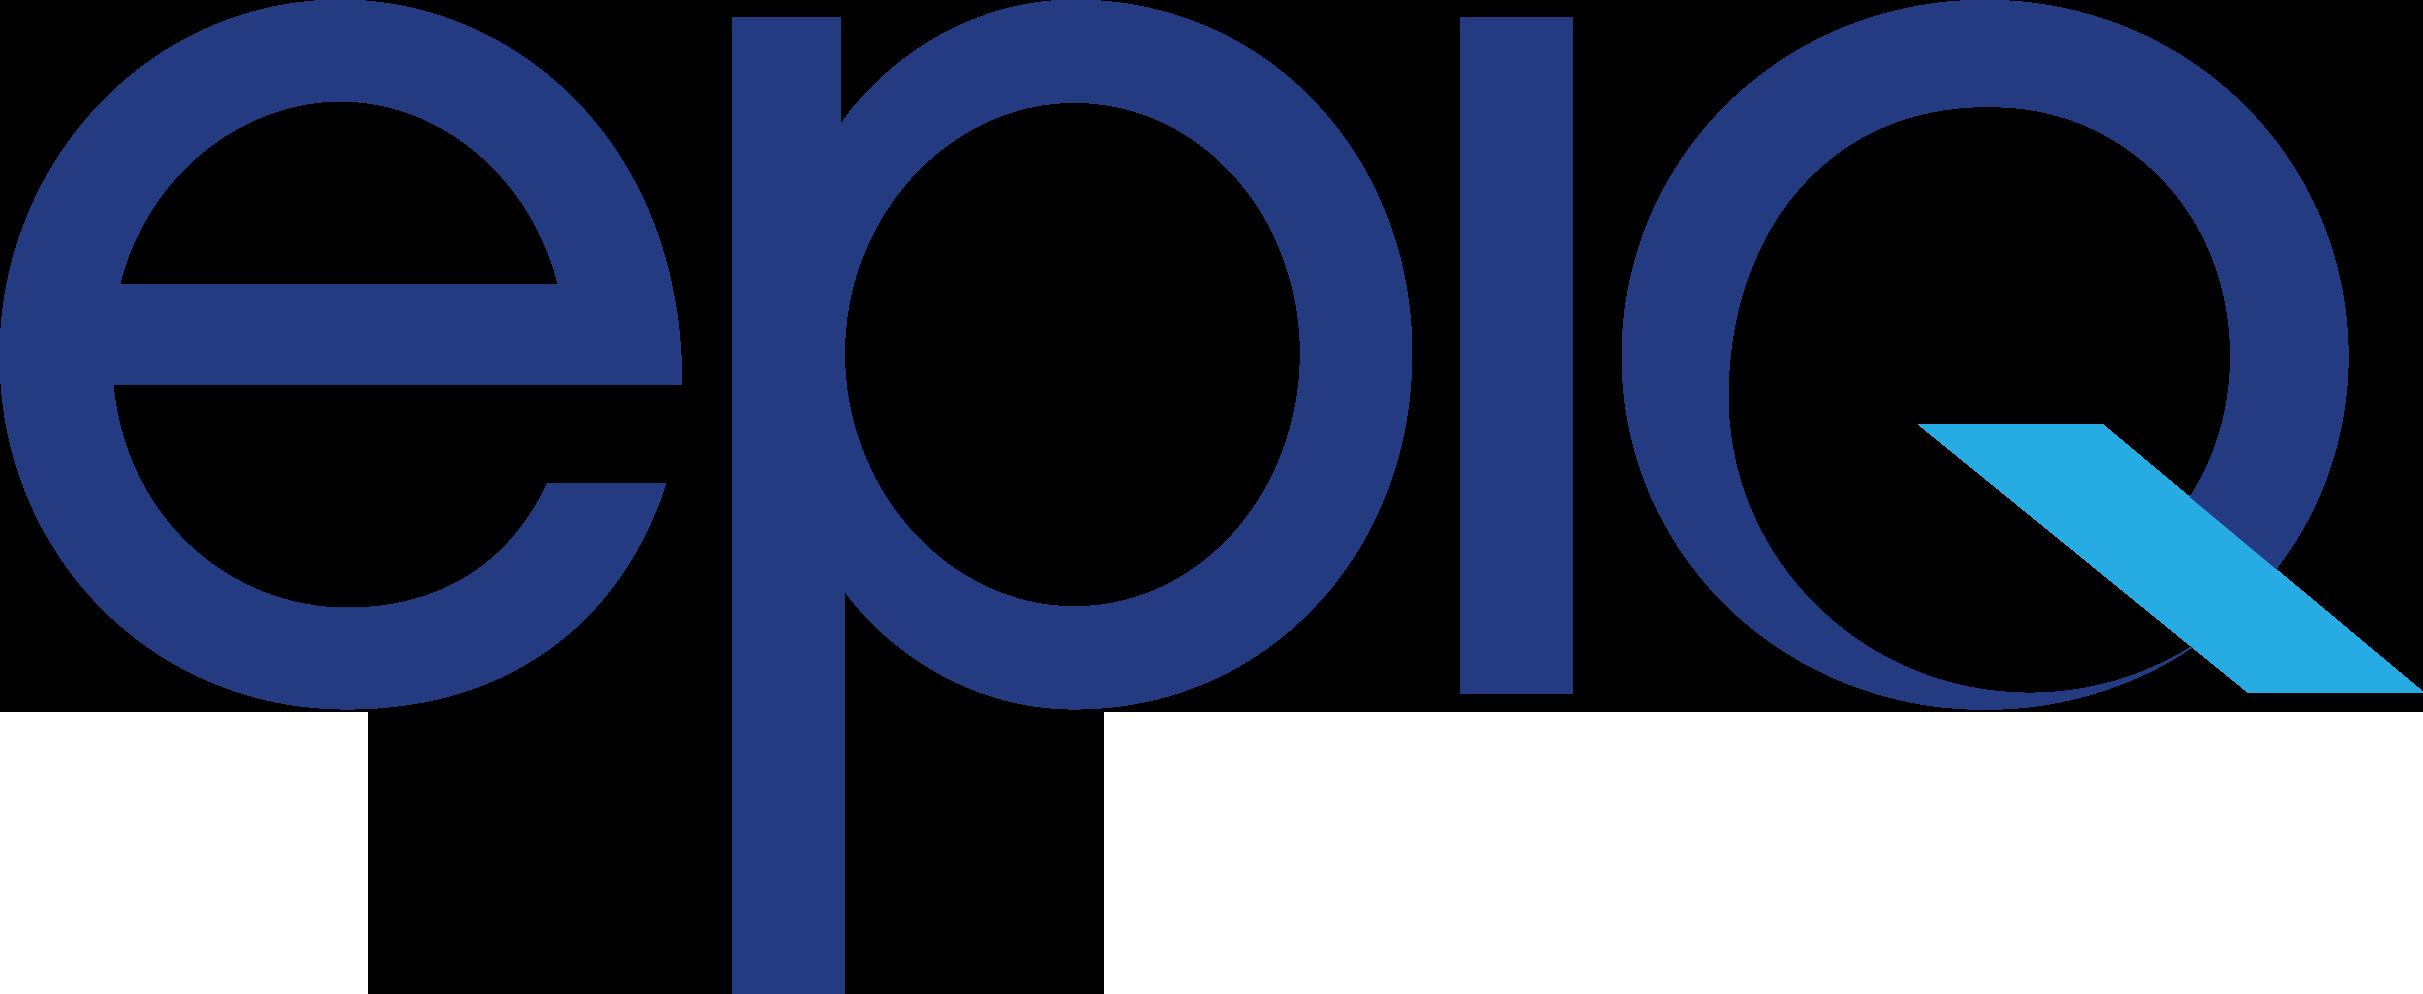 Epiq eDiscovery Platform logo